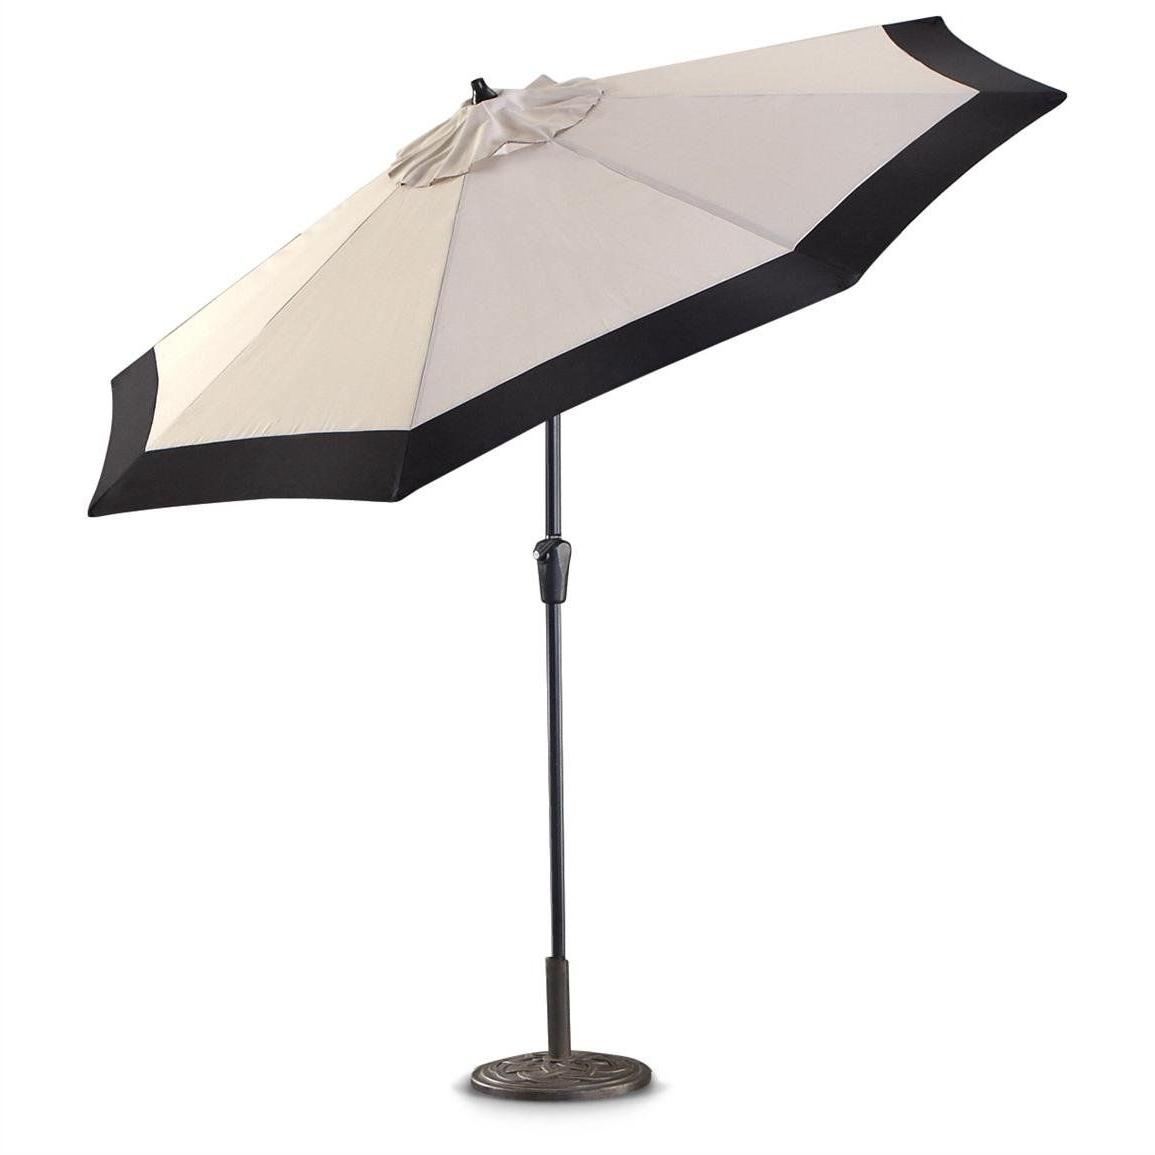 White Patio Umbrellas #5: Castlecreek 9 Two Tone Deluxe Market Patio Throughout Recent Deluxe Patio Umbrellas (View 18 of 20)